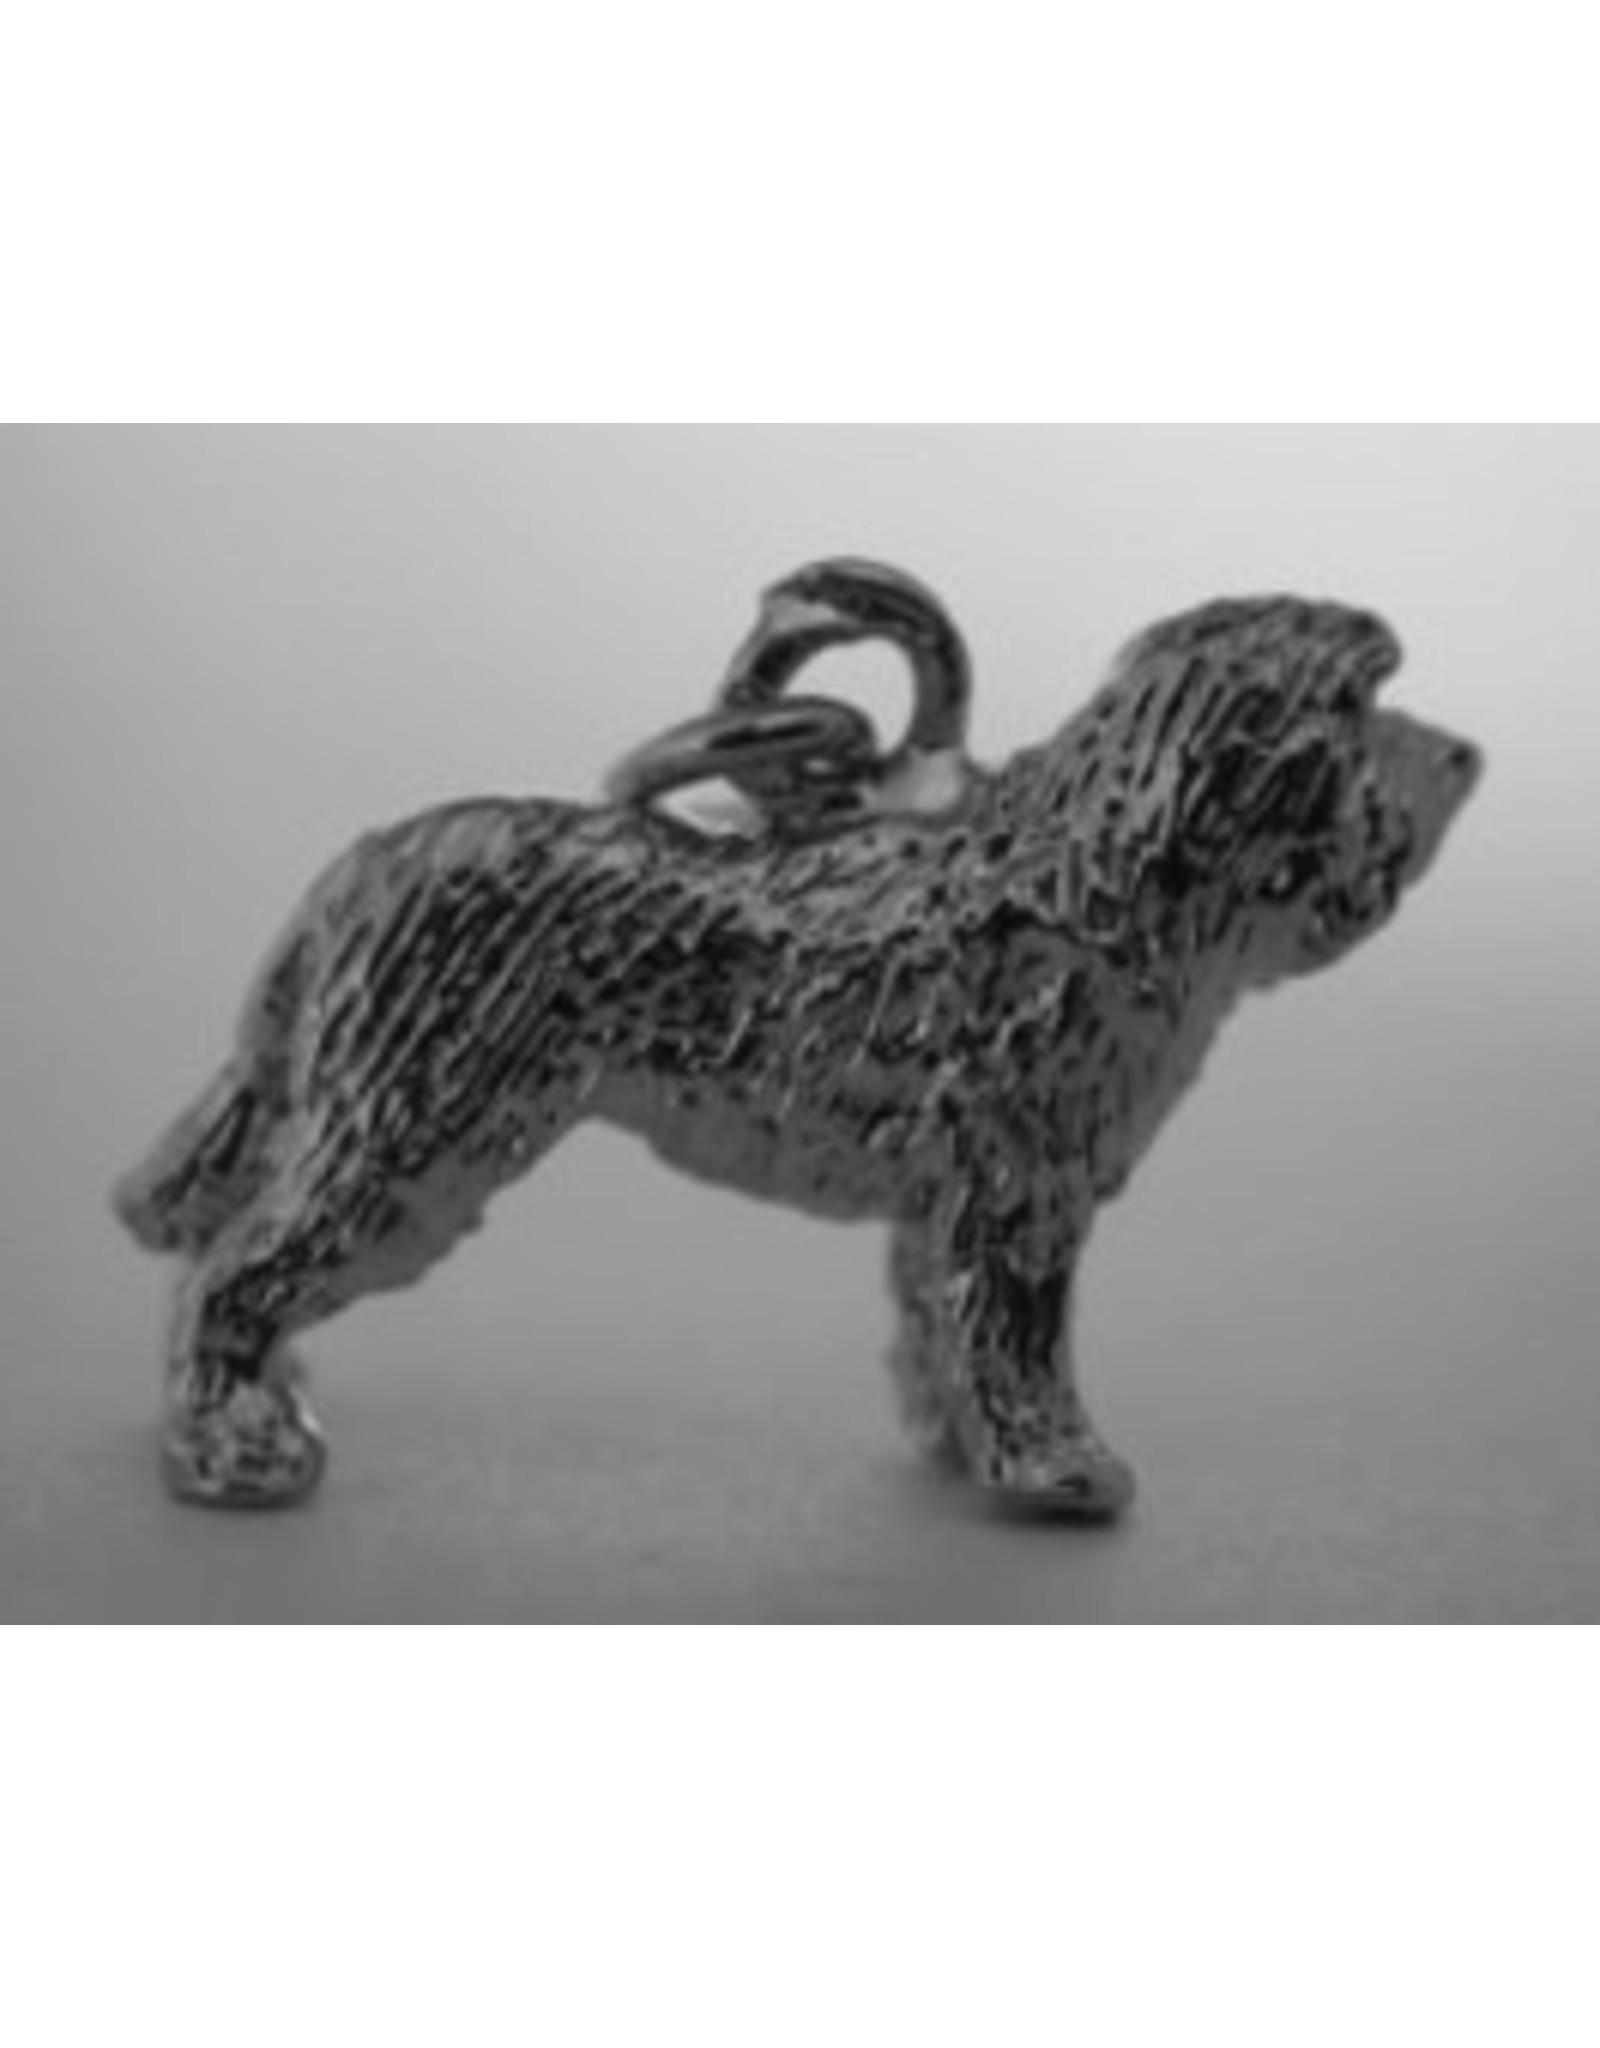 Handmade by Hanneke Weigel Zilveren Cao da serra de aires